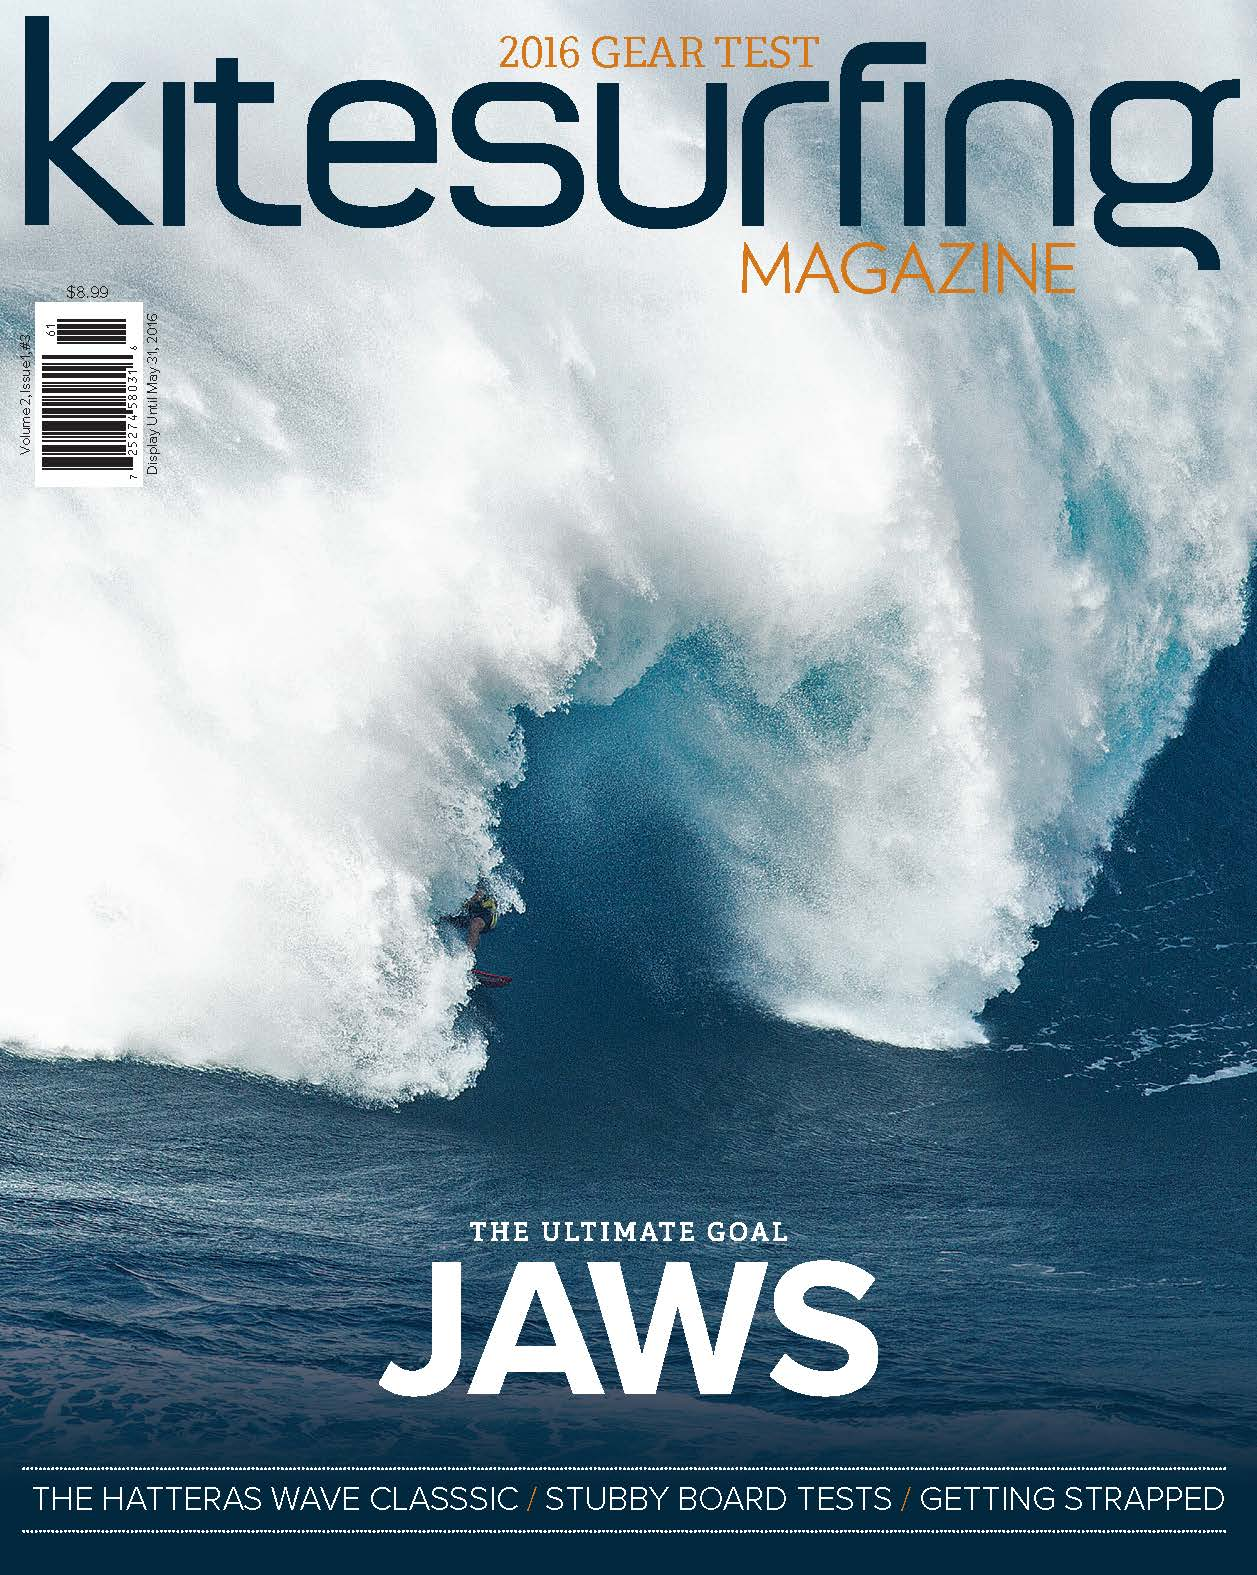 Kitesurfing Magazine Cover_#3